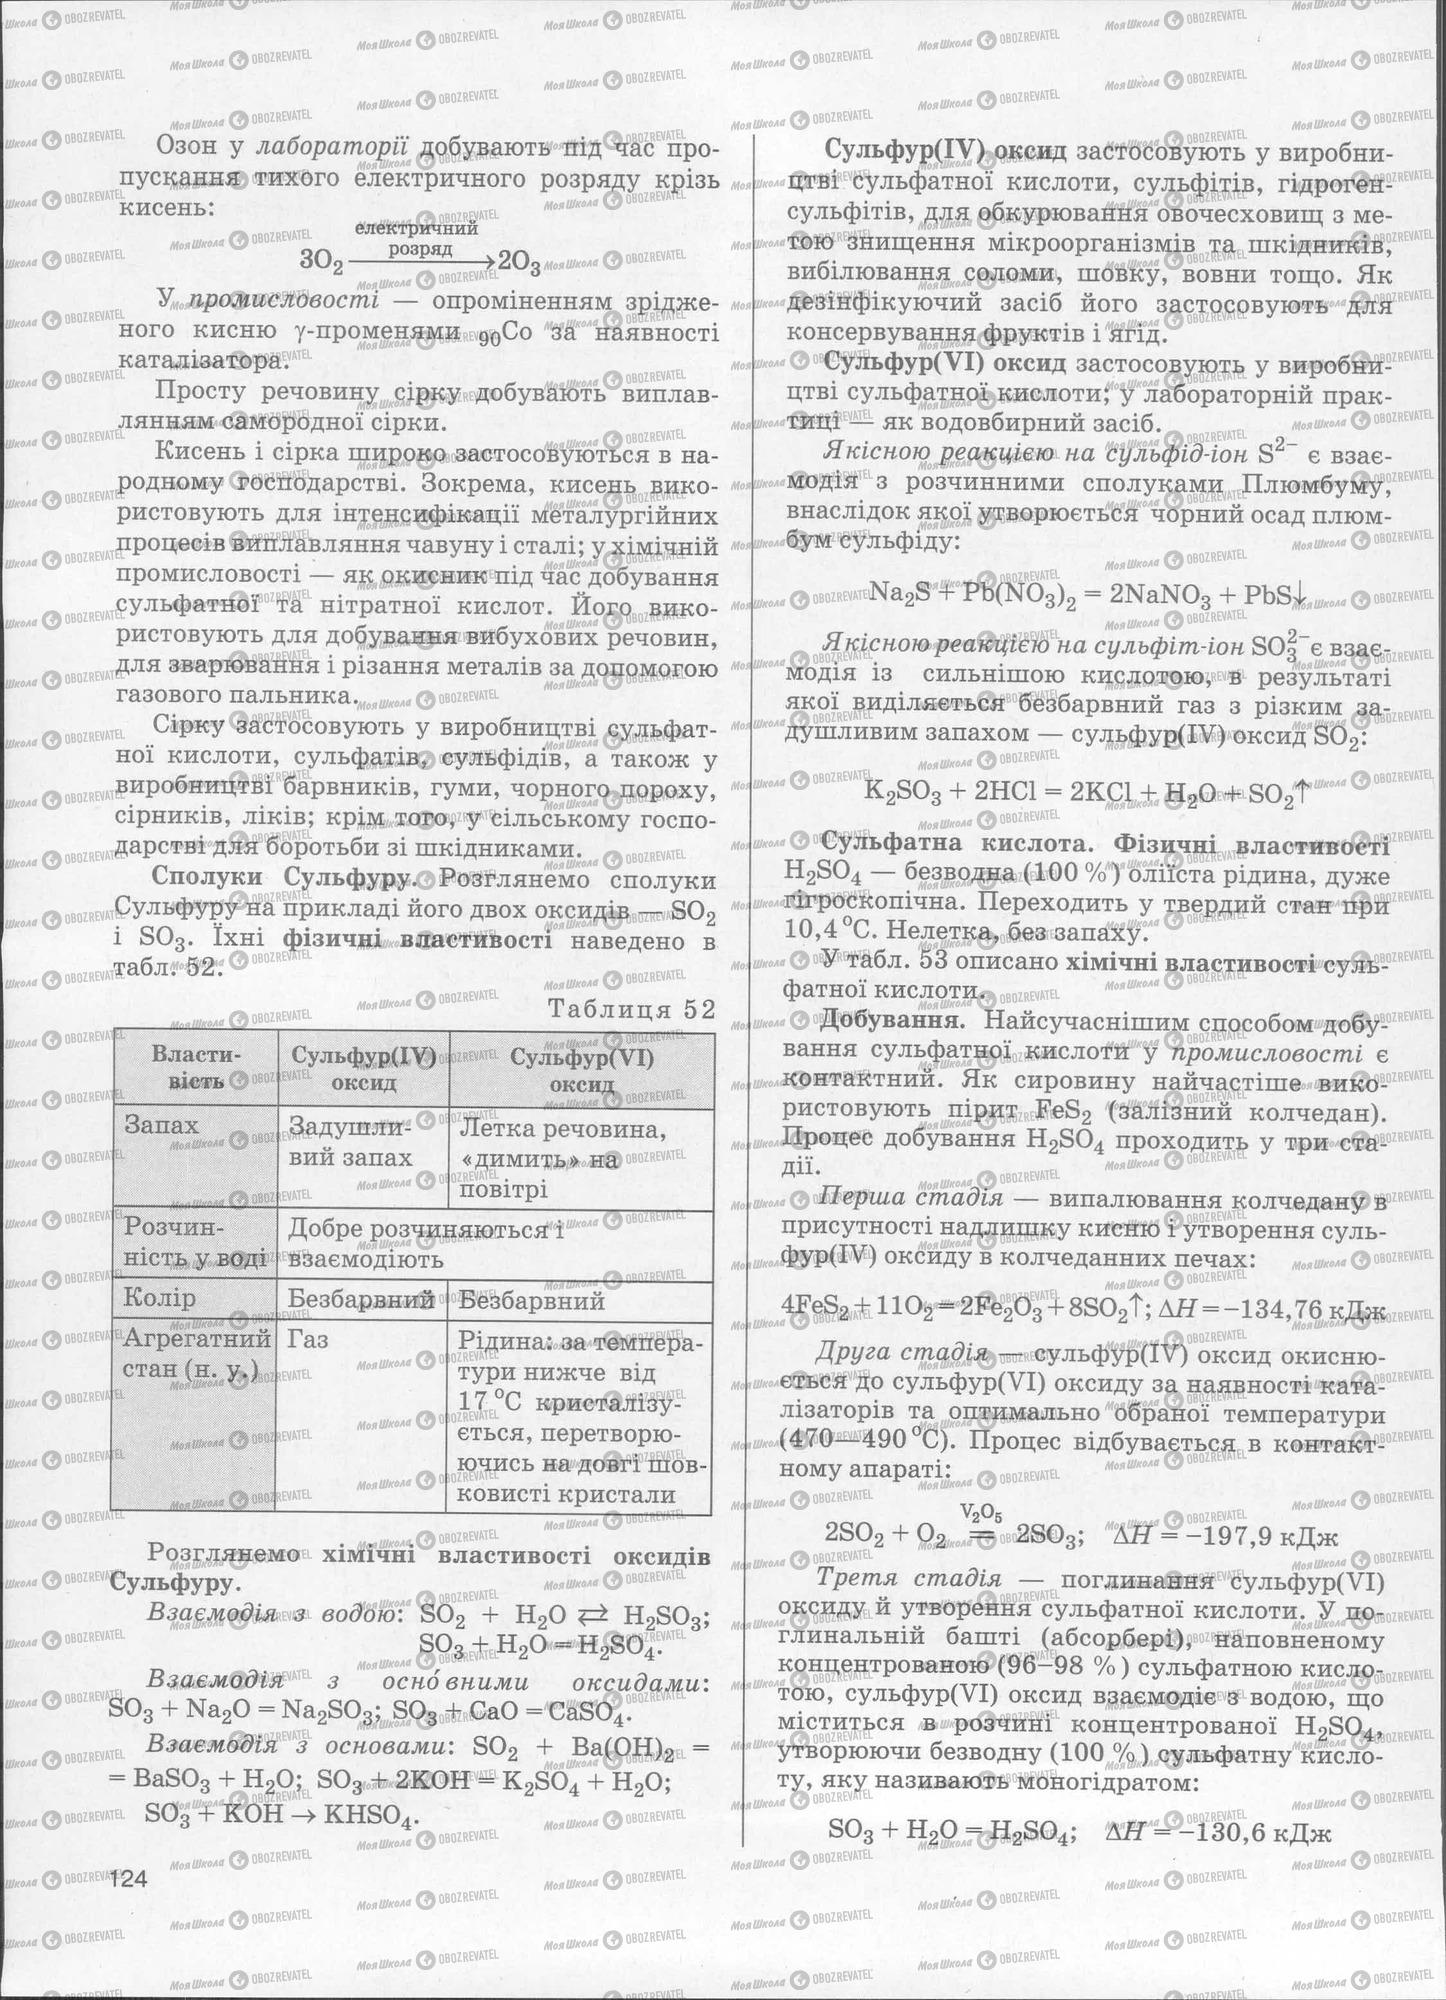 ЗНО Химия 11 класс страница  124